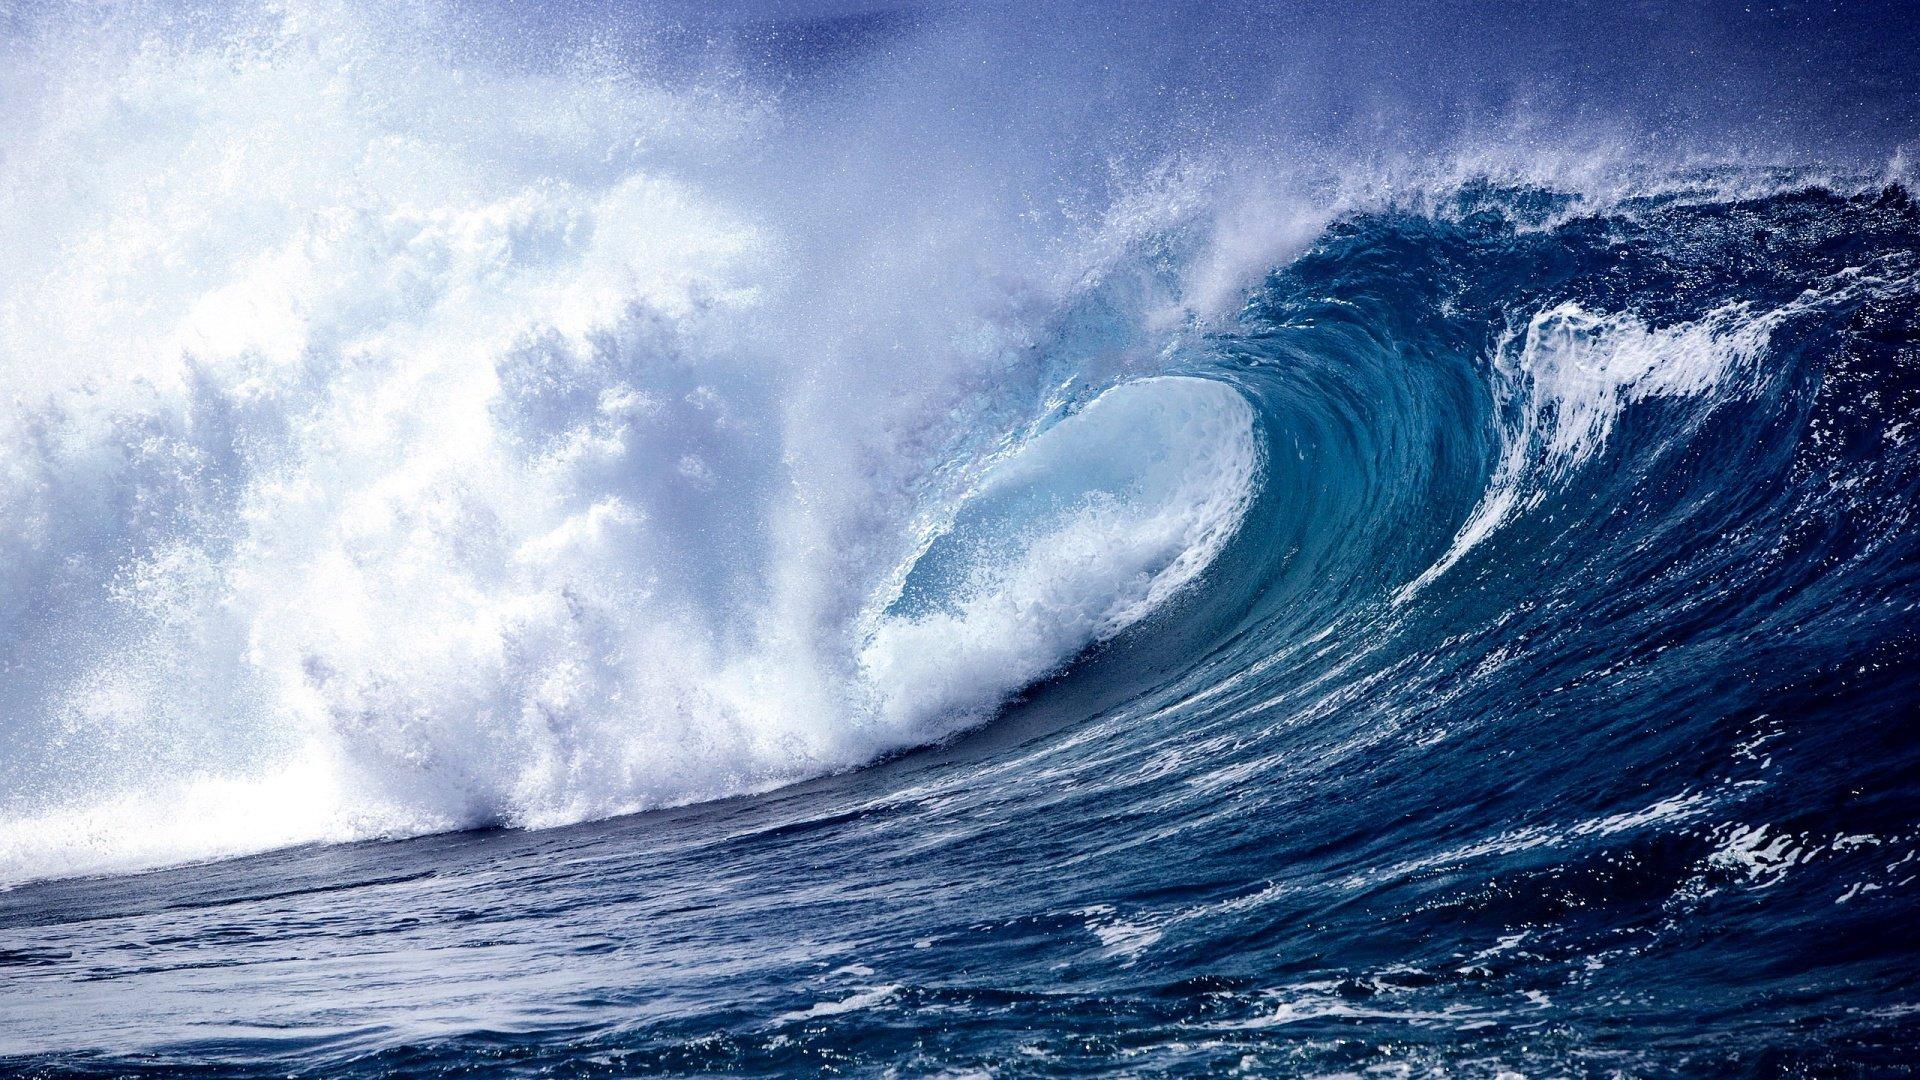 Hd Wallpapers 1080p Ocean: Download-ocean-waves-wallpaper-hd